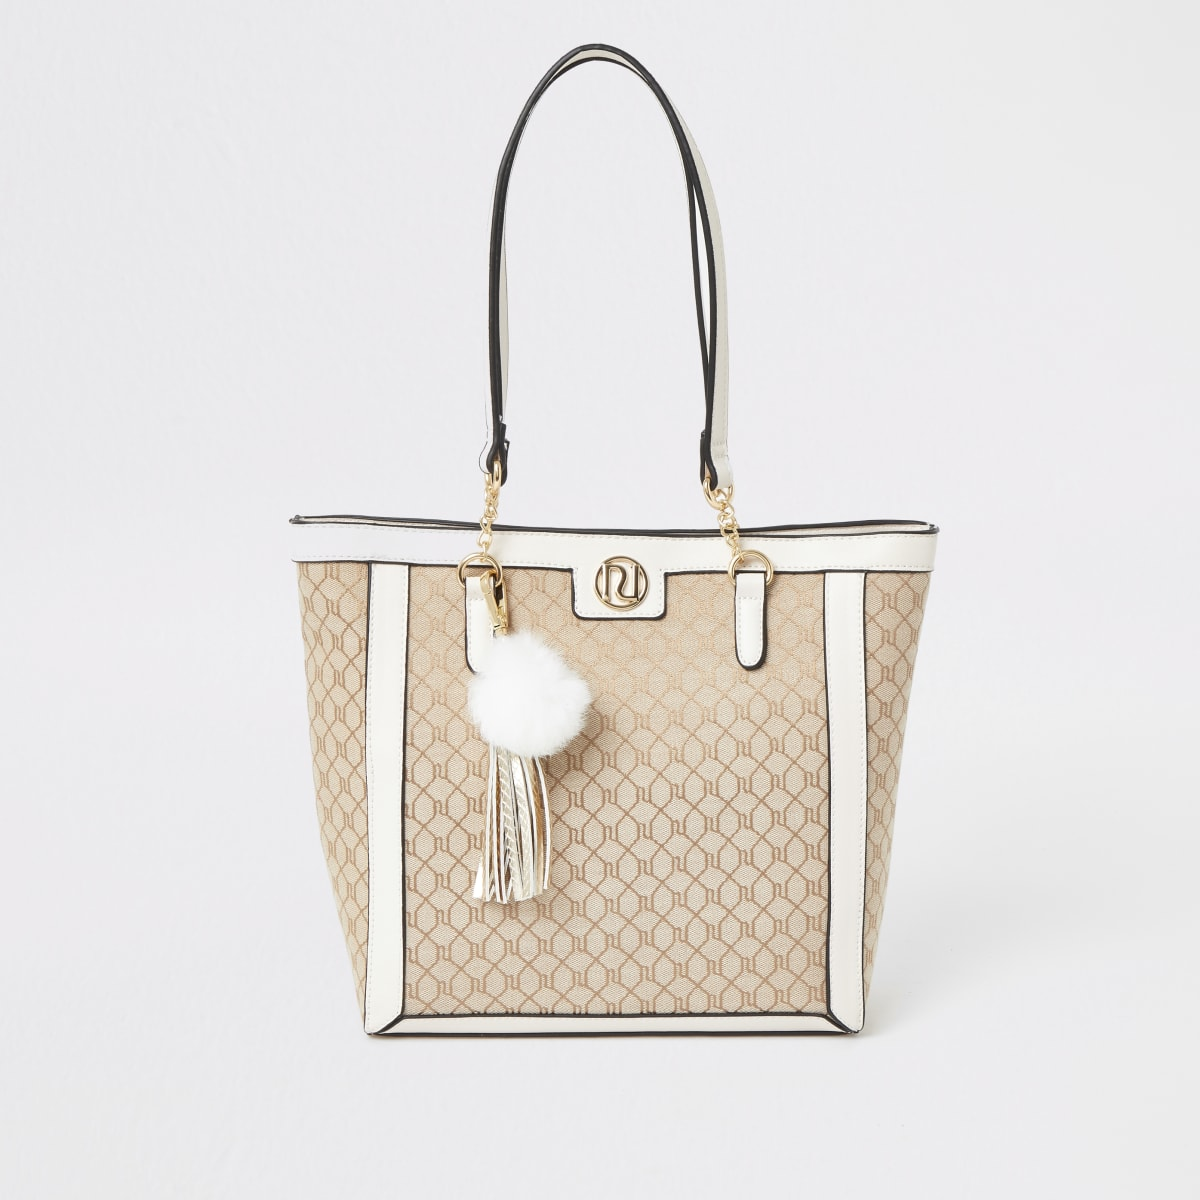 Crèmekleurige jacquard shopper voor meisjes